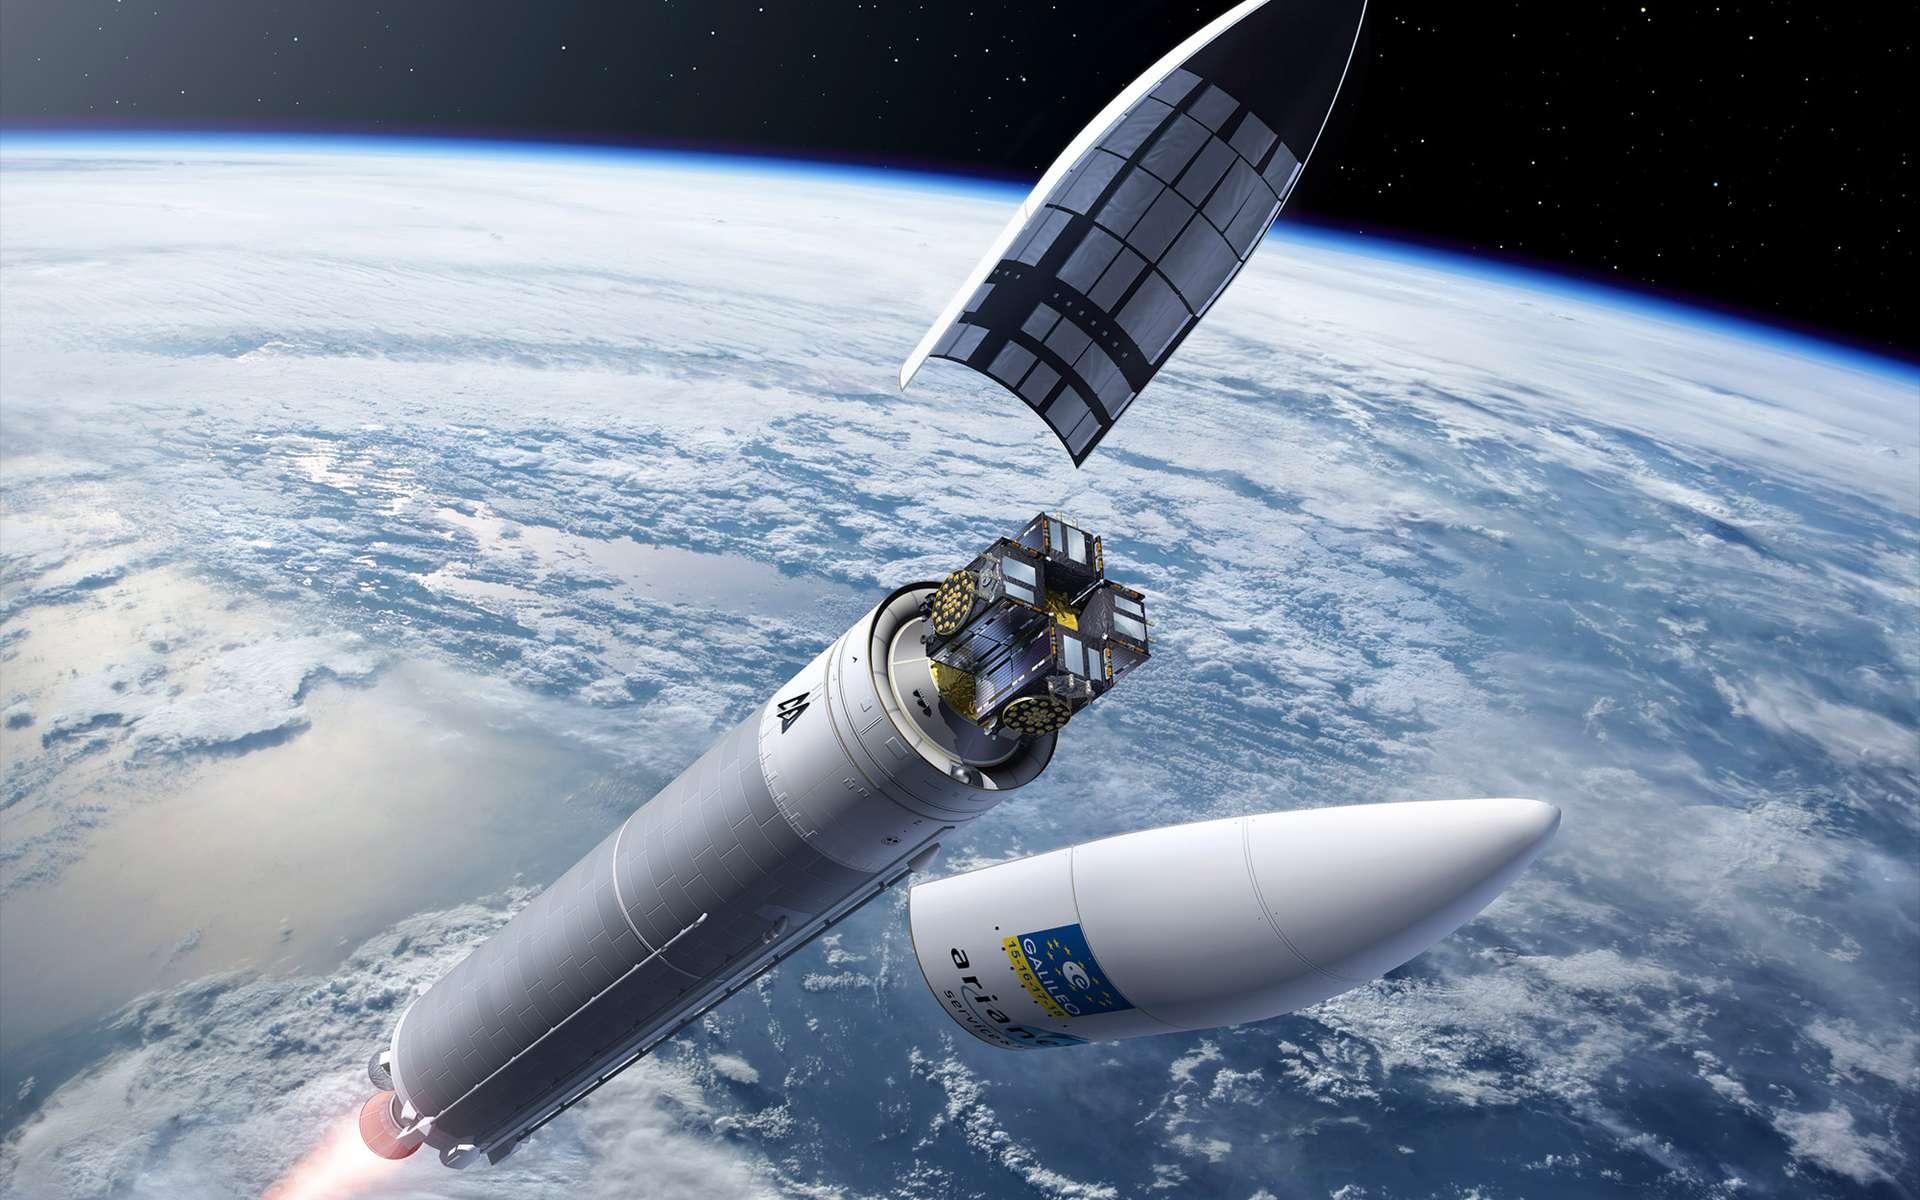 En 2016, une Ariane 5 (ES) plaçait en orbite, en un seul vol, quatre satellites de la constellation Galileo. © Esa, P. Carril